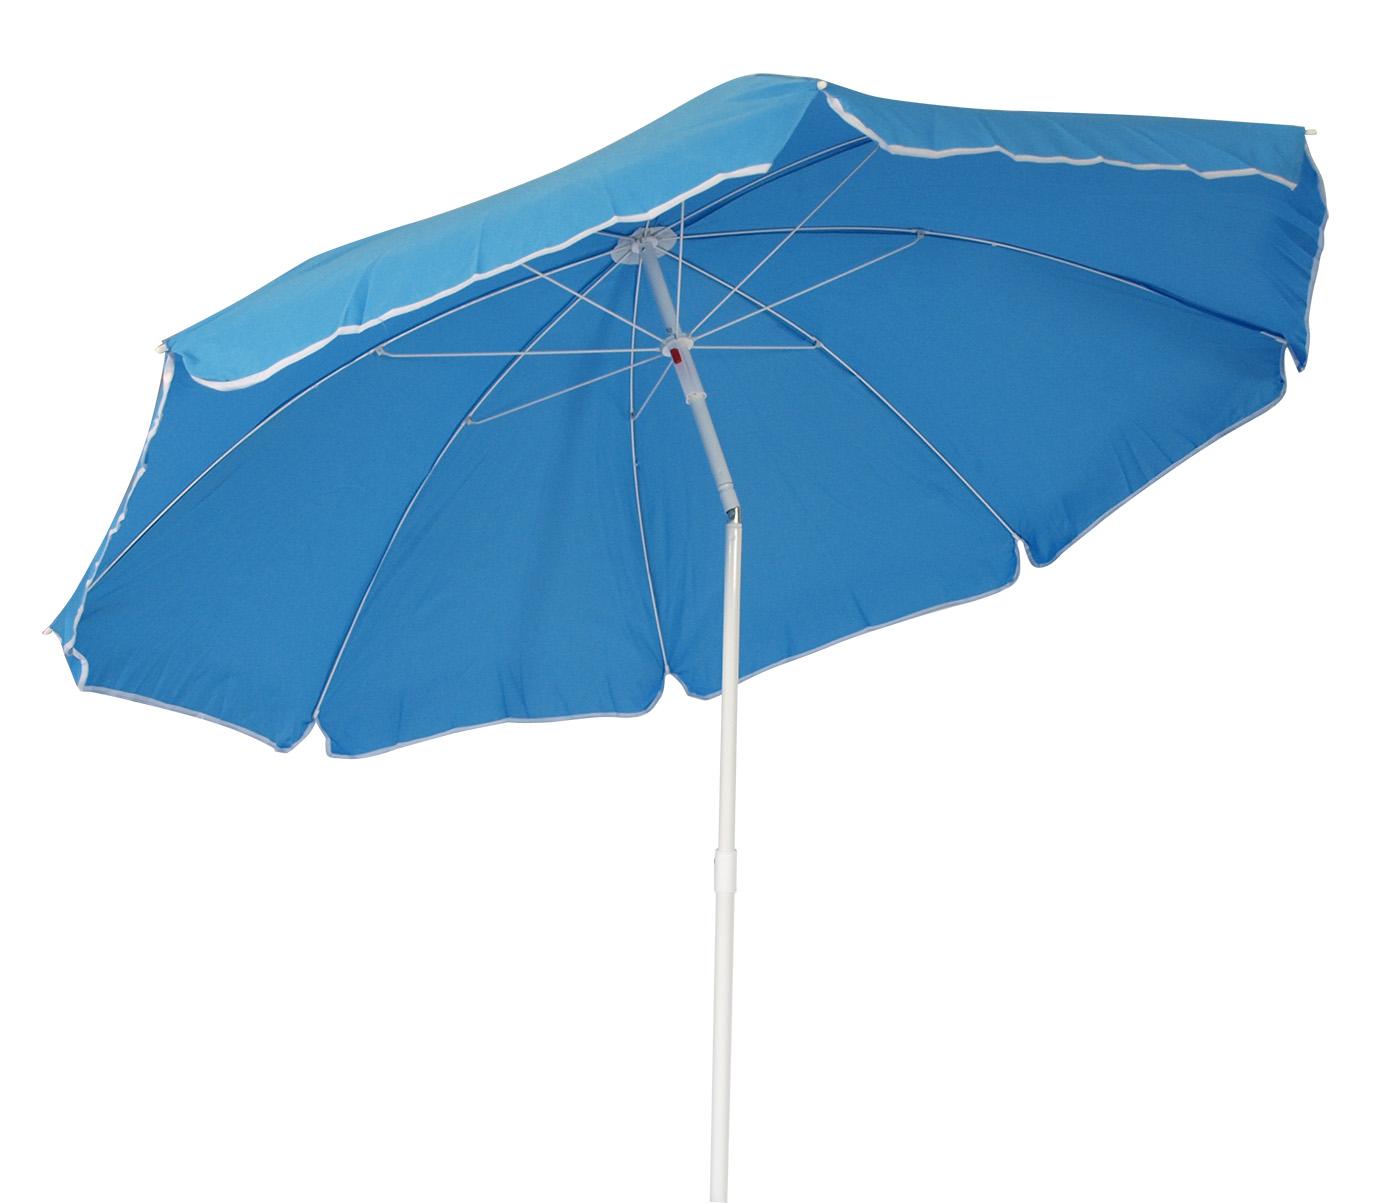 strandschirm sonnenschirm knickschirm garten schirm 180cm hell blau knickbar. Black Bedroom Furniture Sets. Home Design Ideas